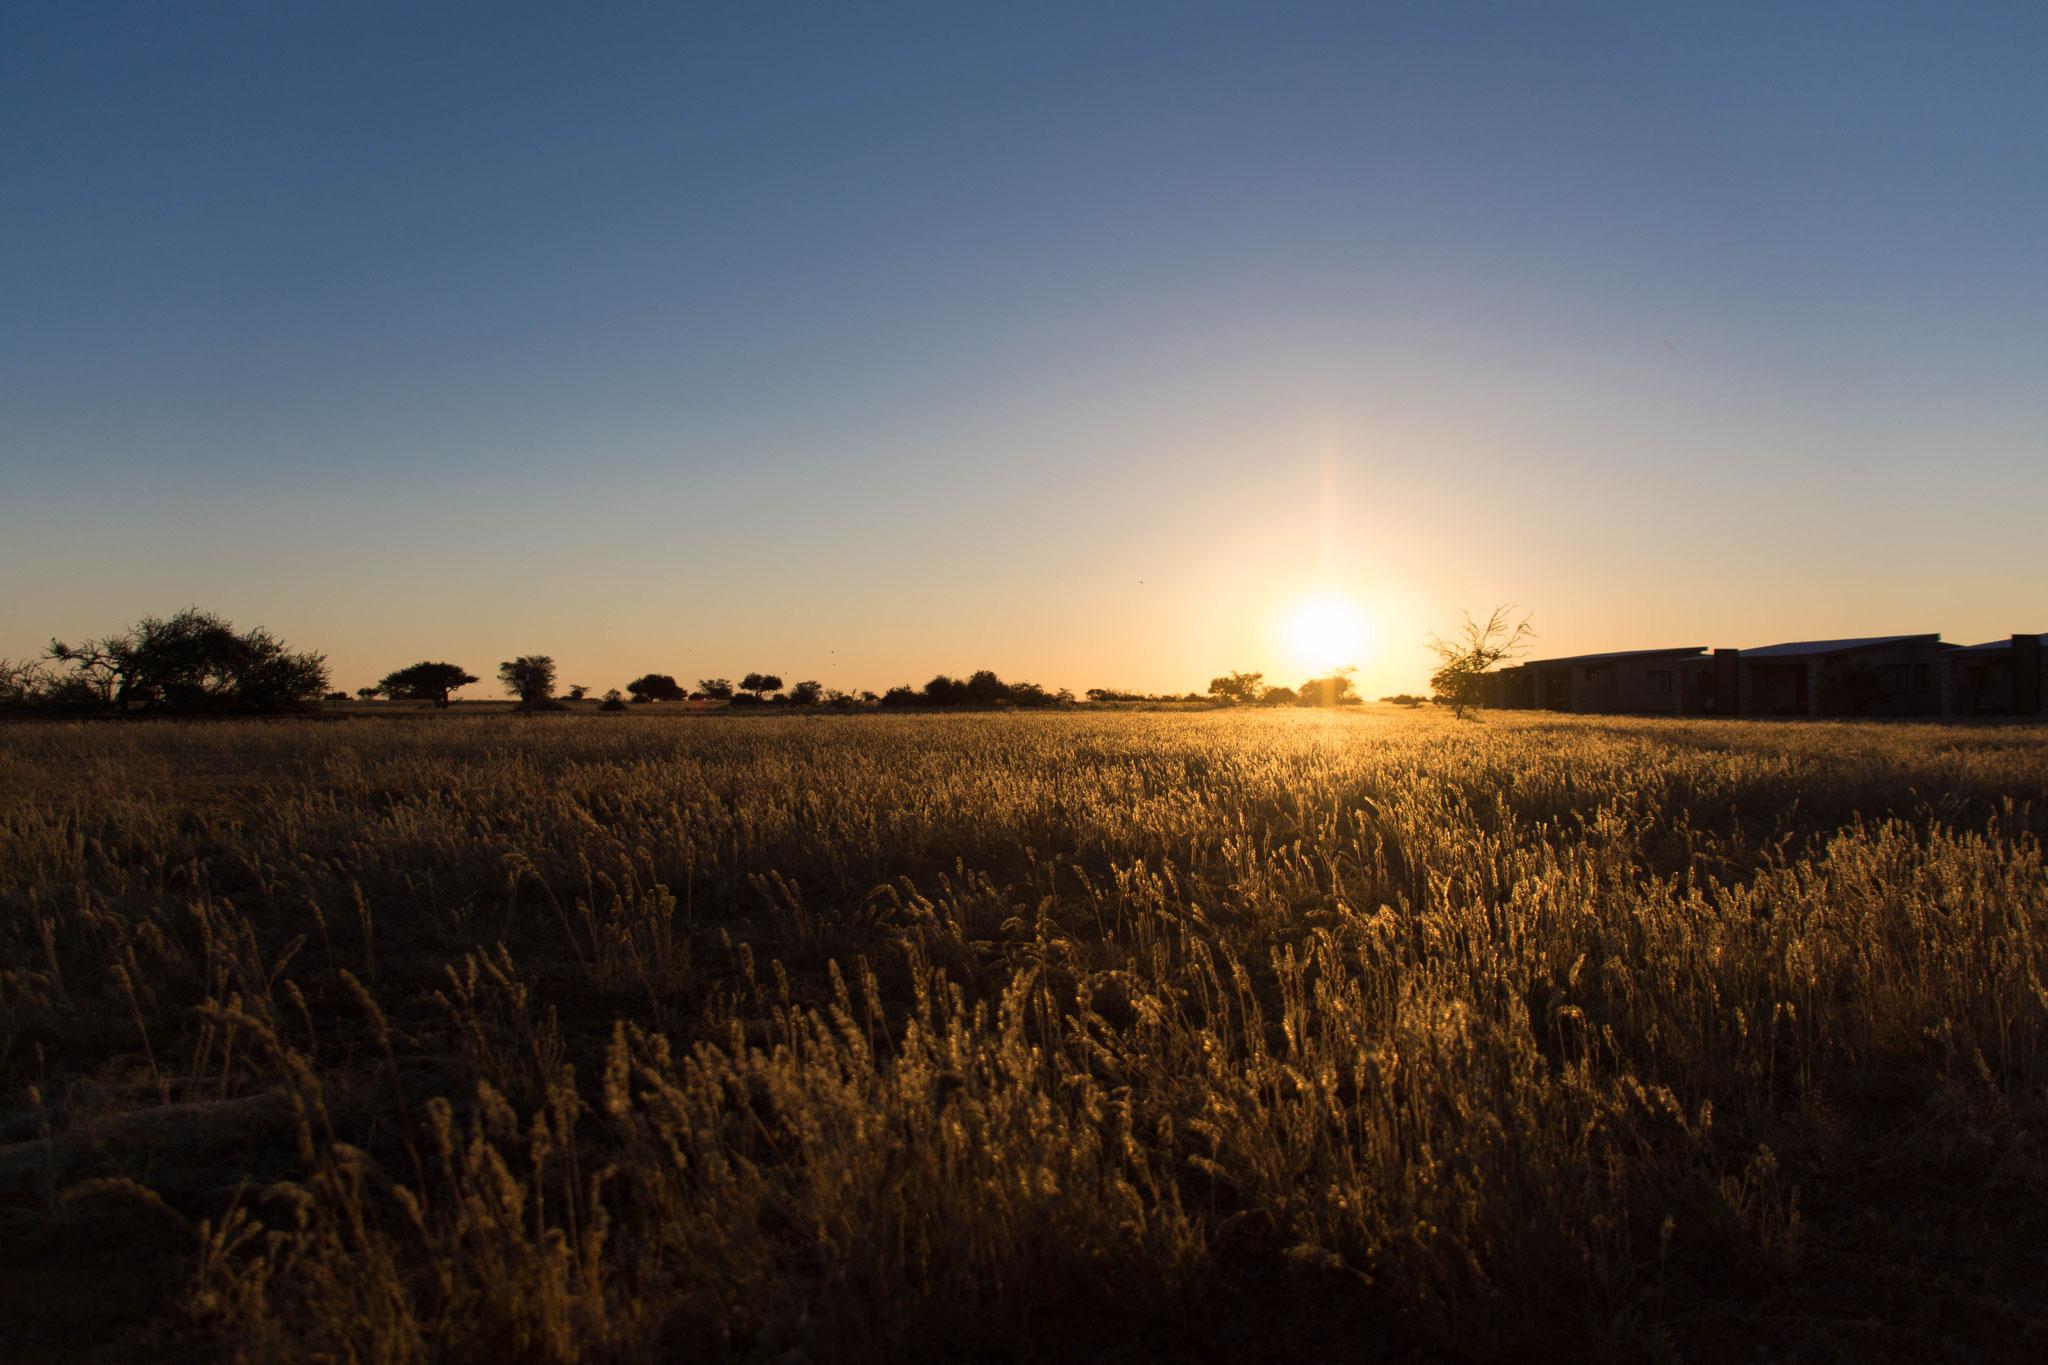 Sonnenuntergang über dem Grasland